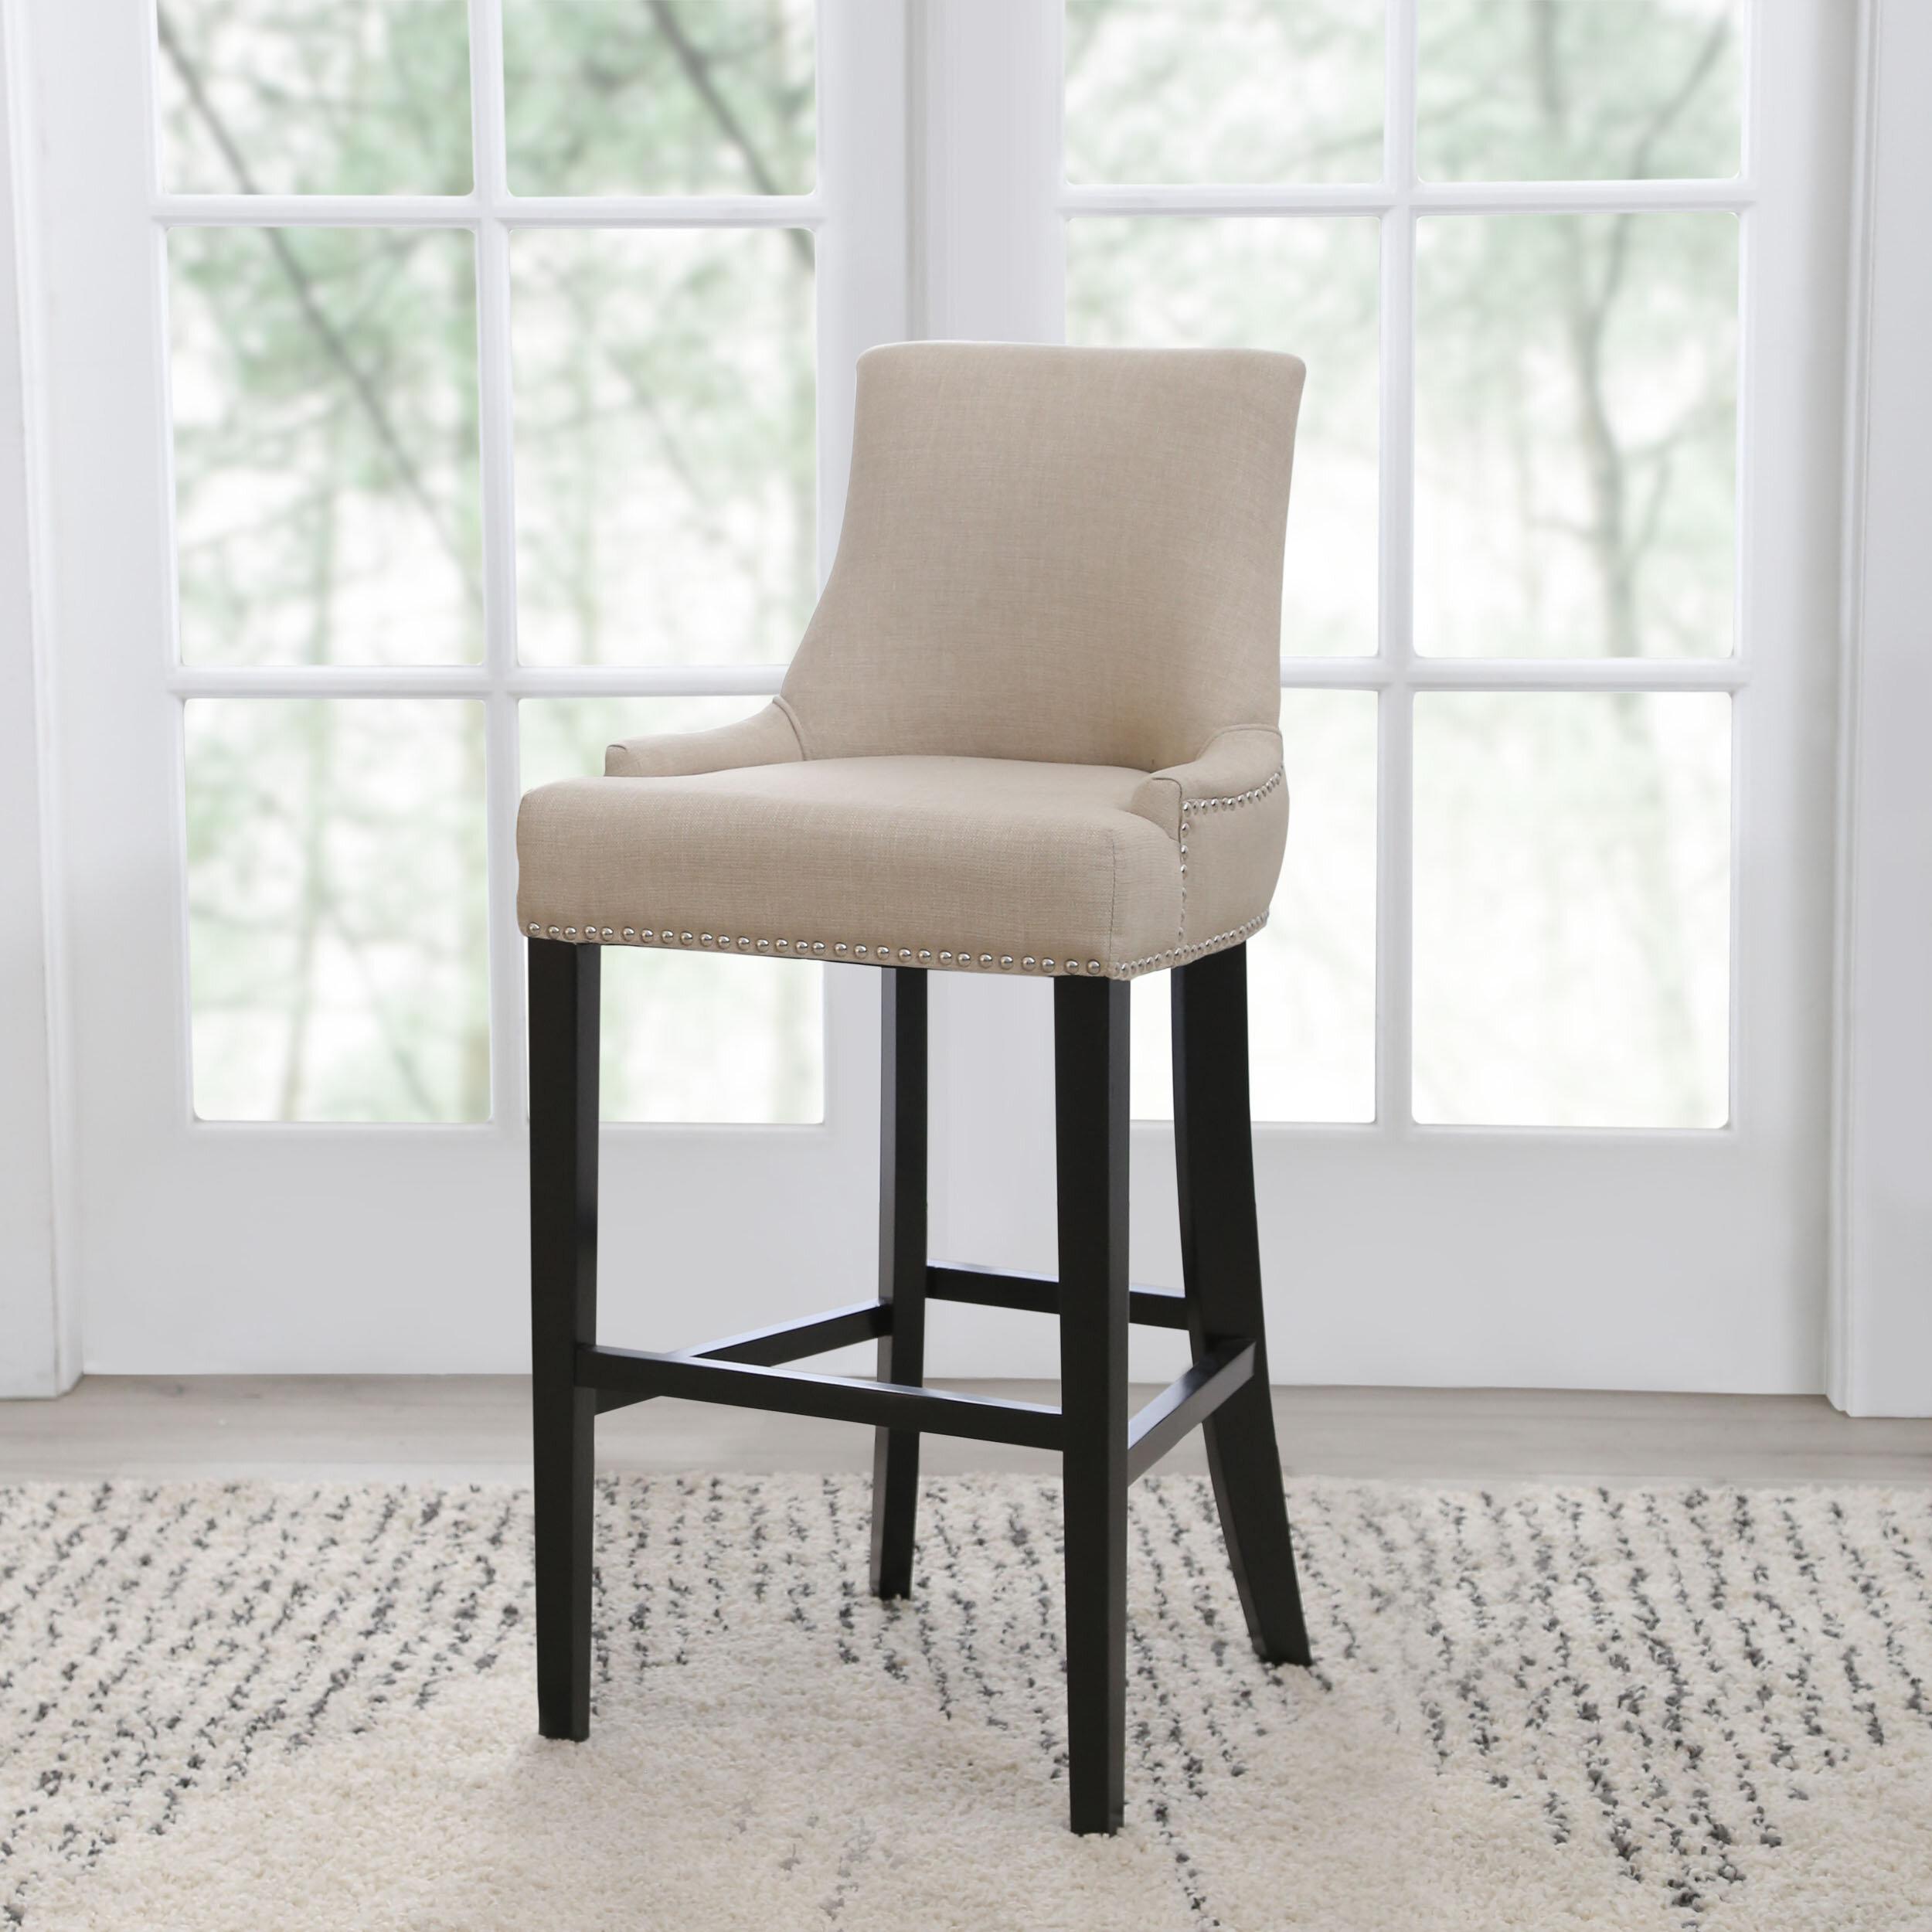 Admirable Keziah 30 Bar Stool Alphanode Cool Chair Designs And Ideas Alphanodeonline